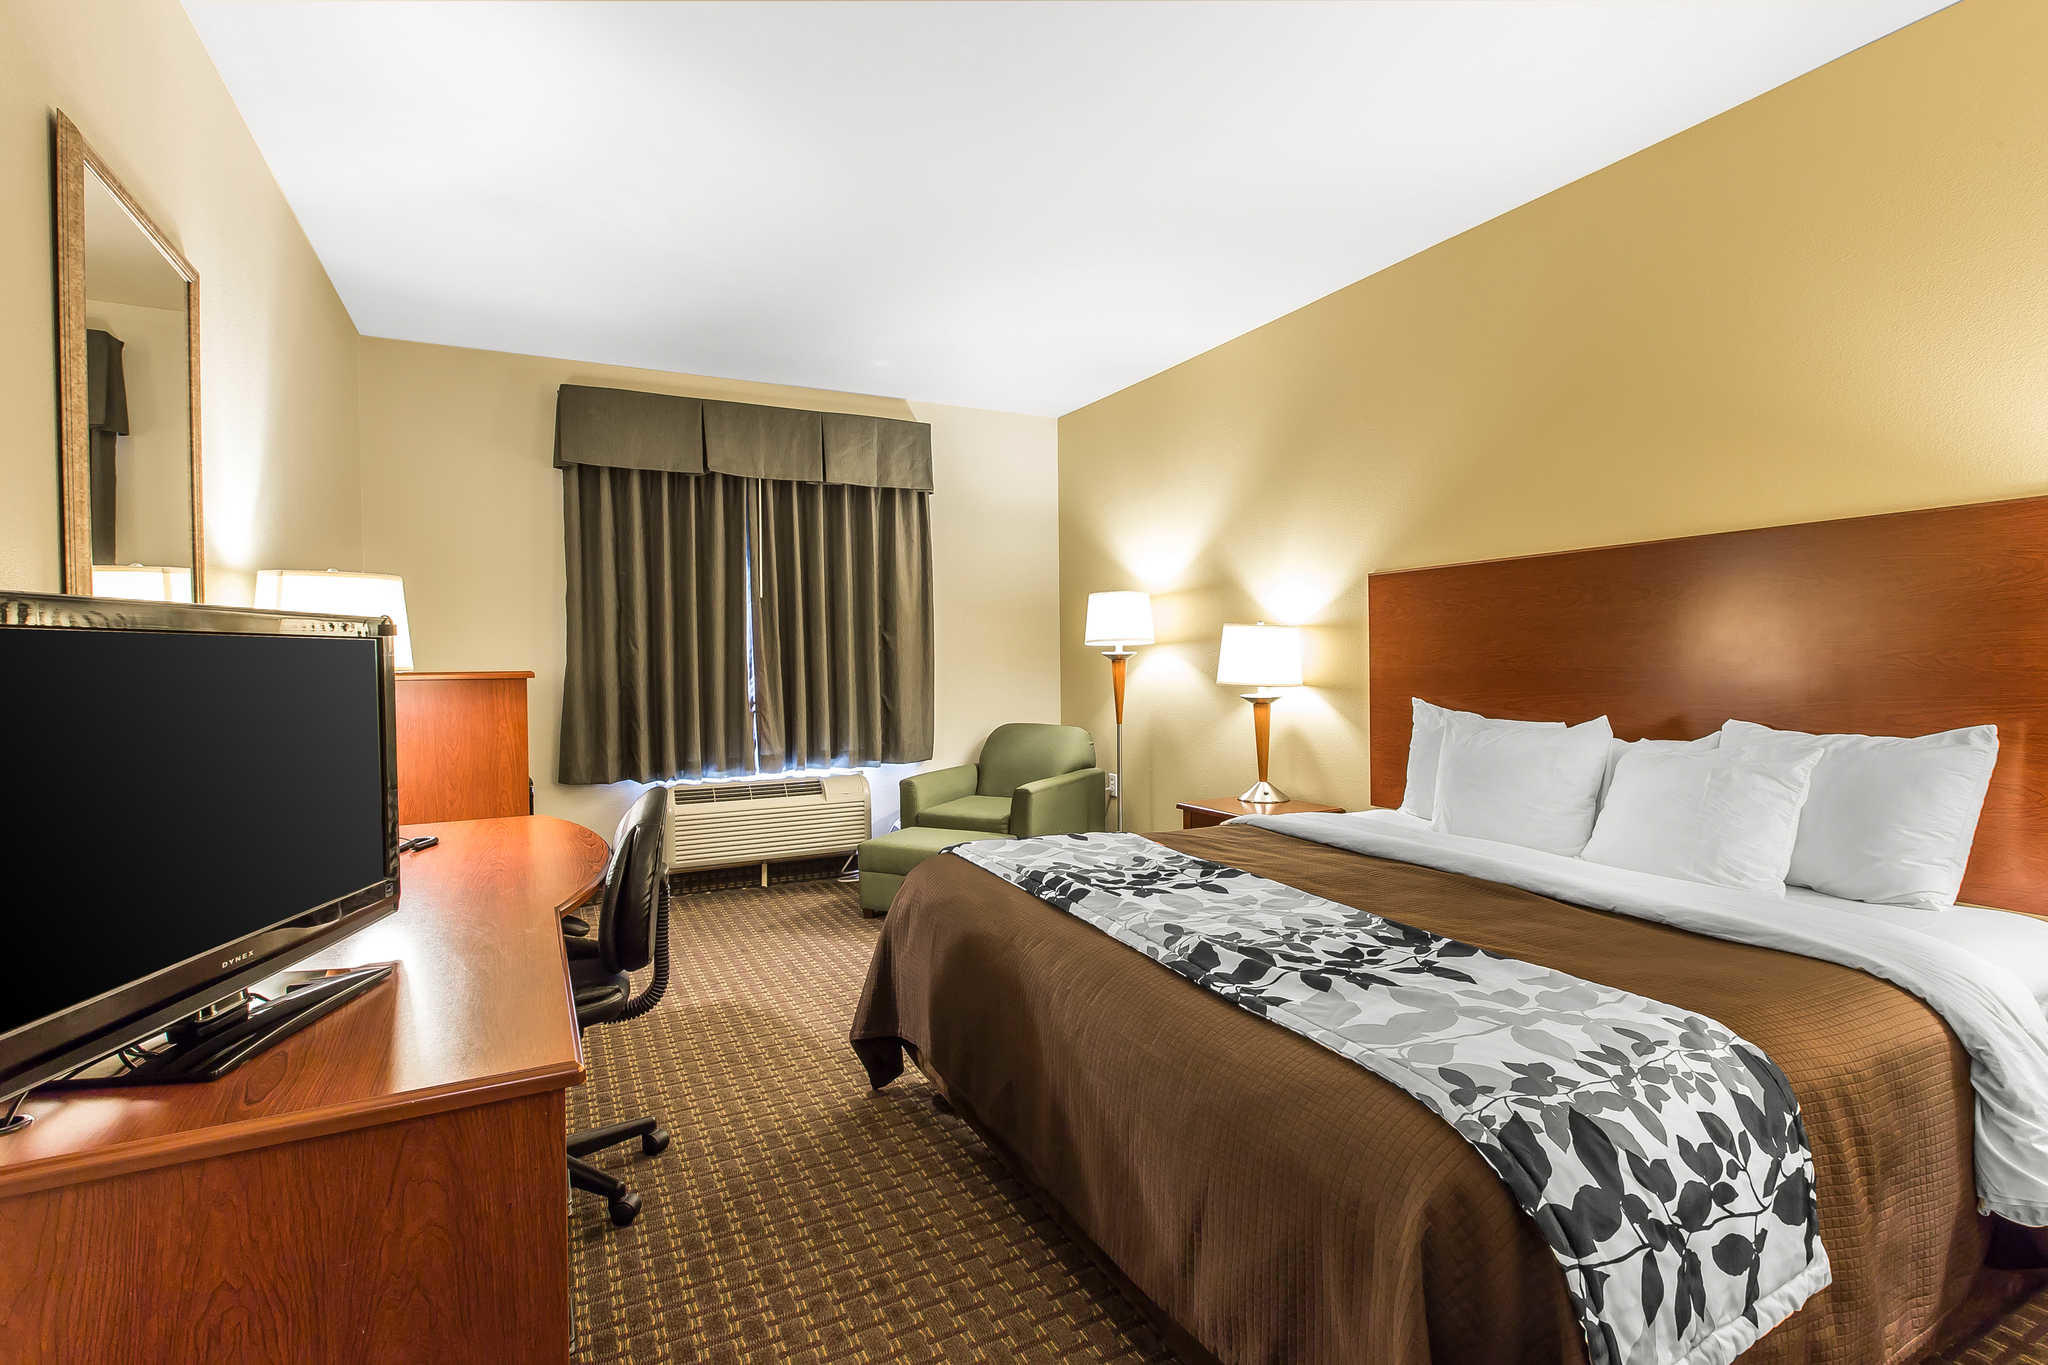 Sleep Inn & Suites At Kennesaw State University image 8